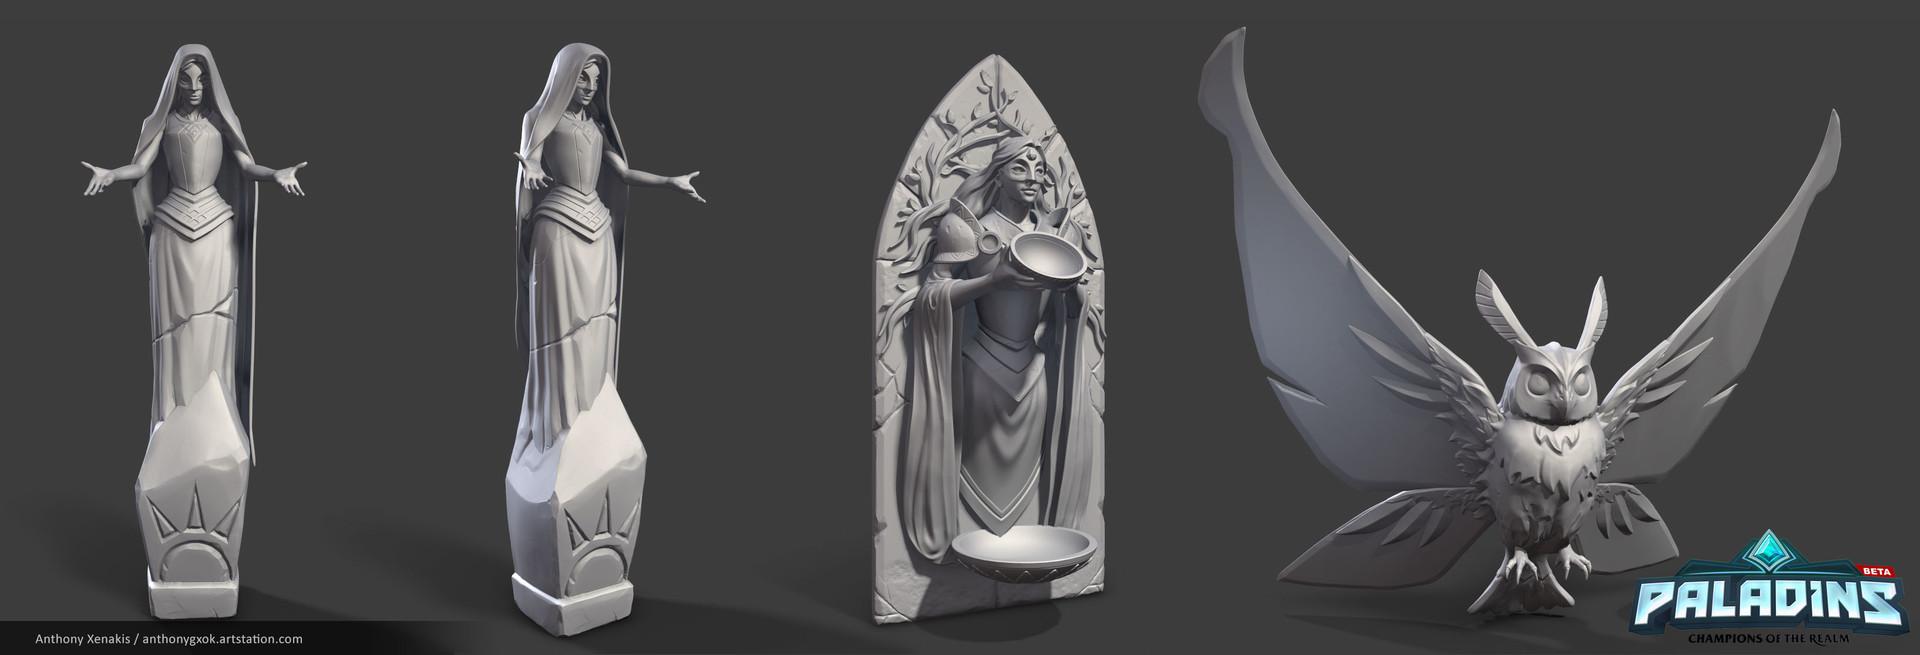 Anthony xenakis statueabowl renders2